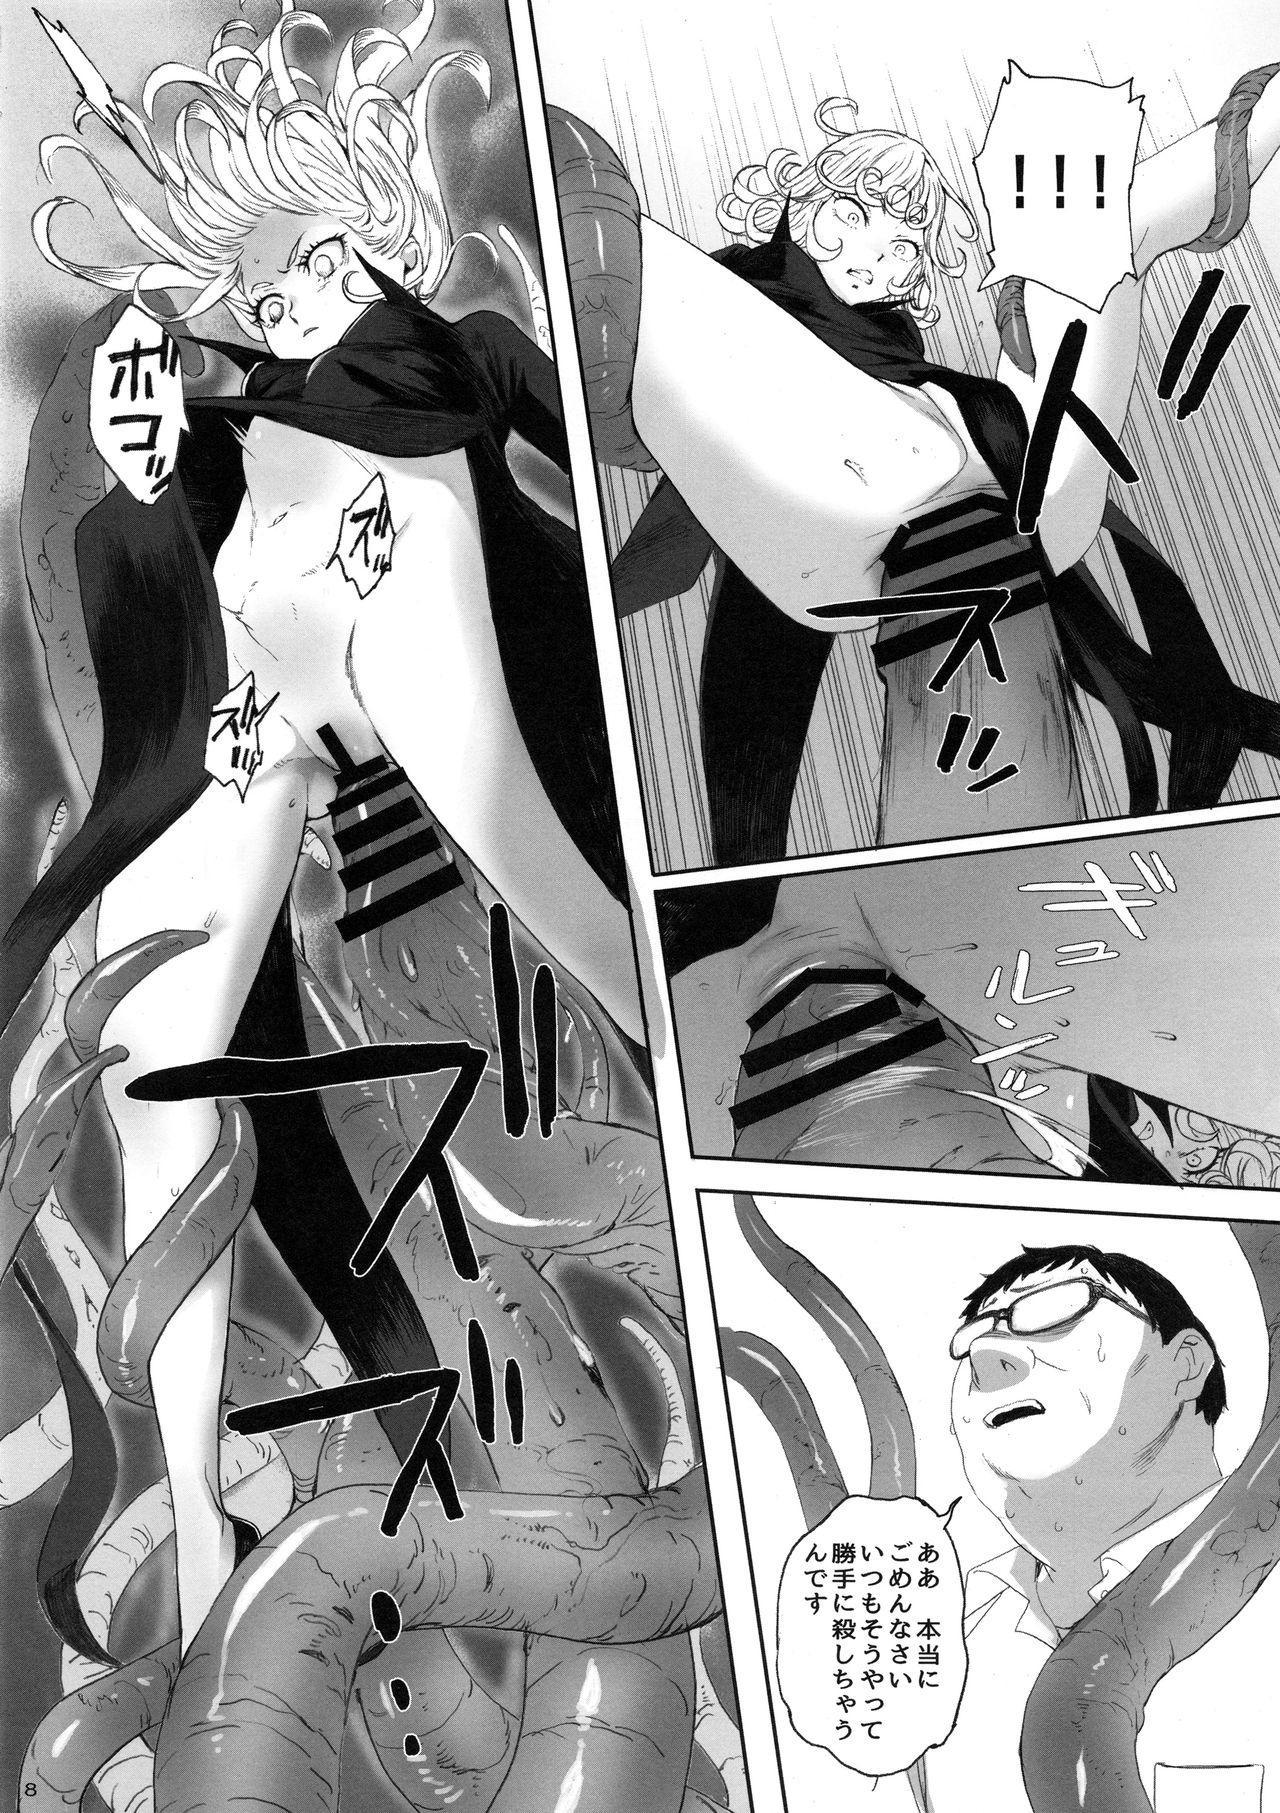 Ichigeki Haiboku 6